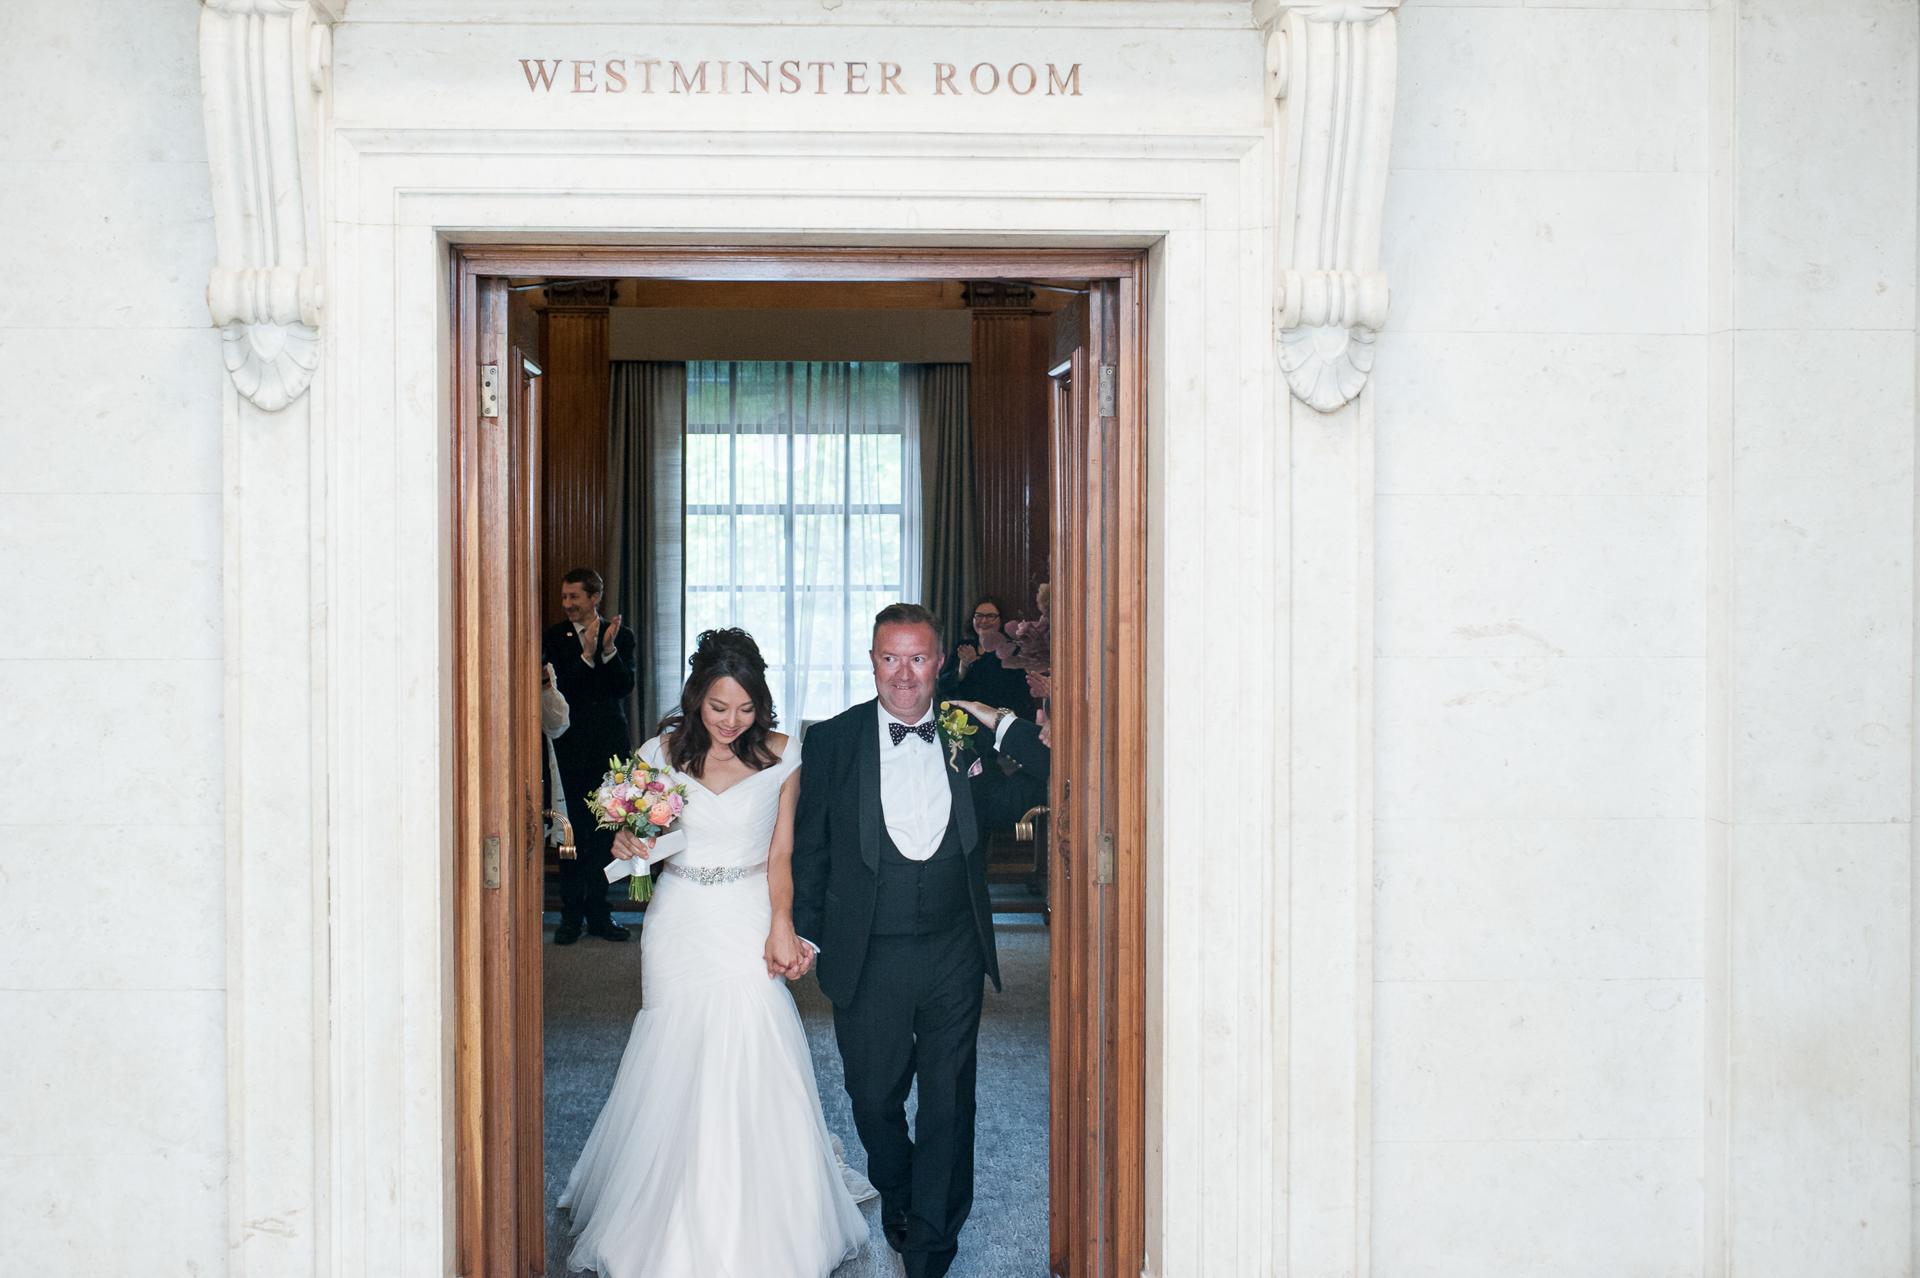 Westminster Room